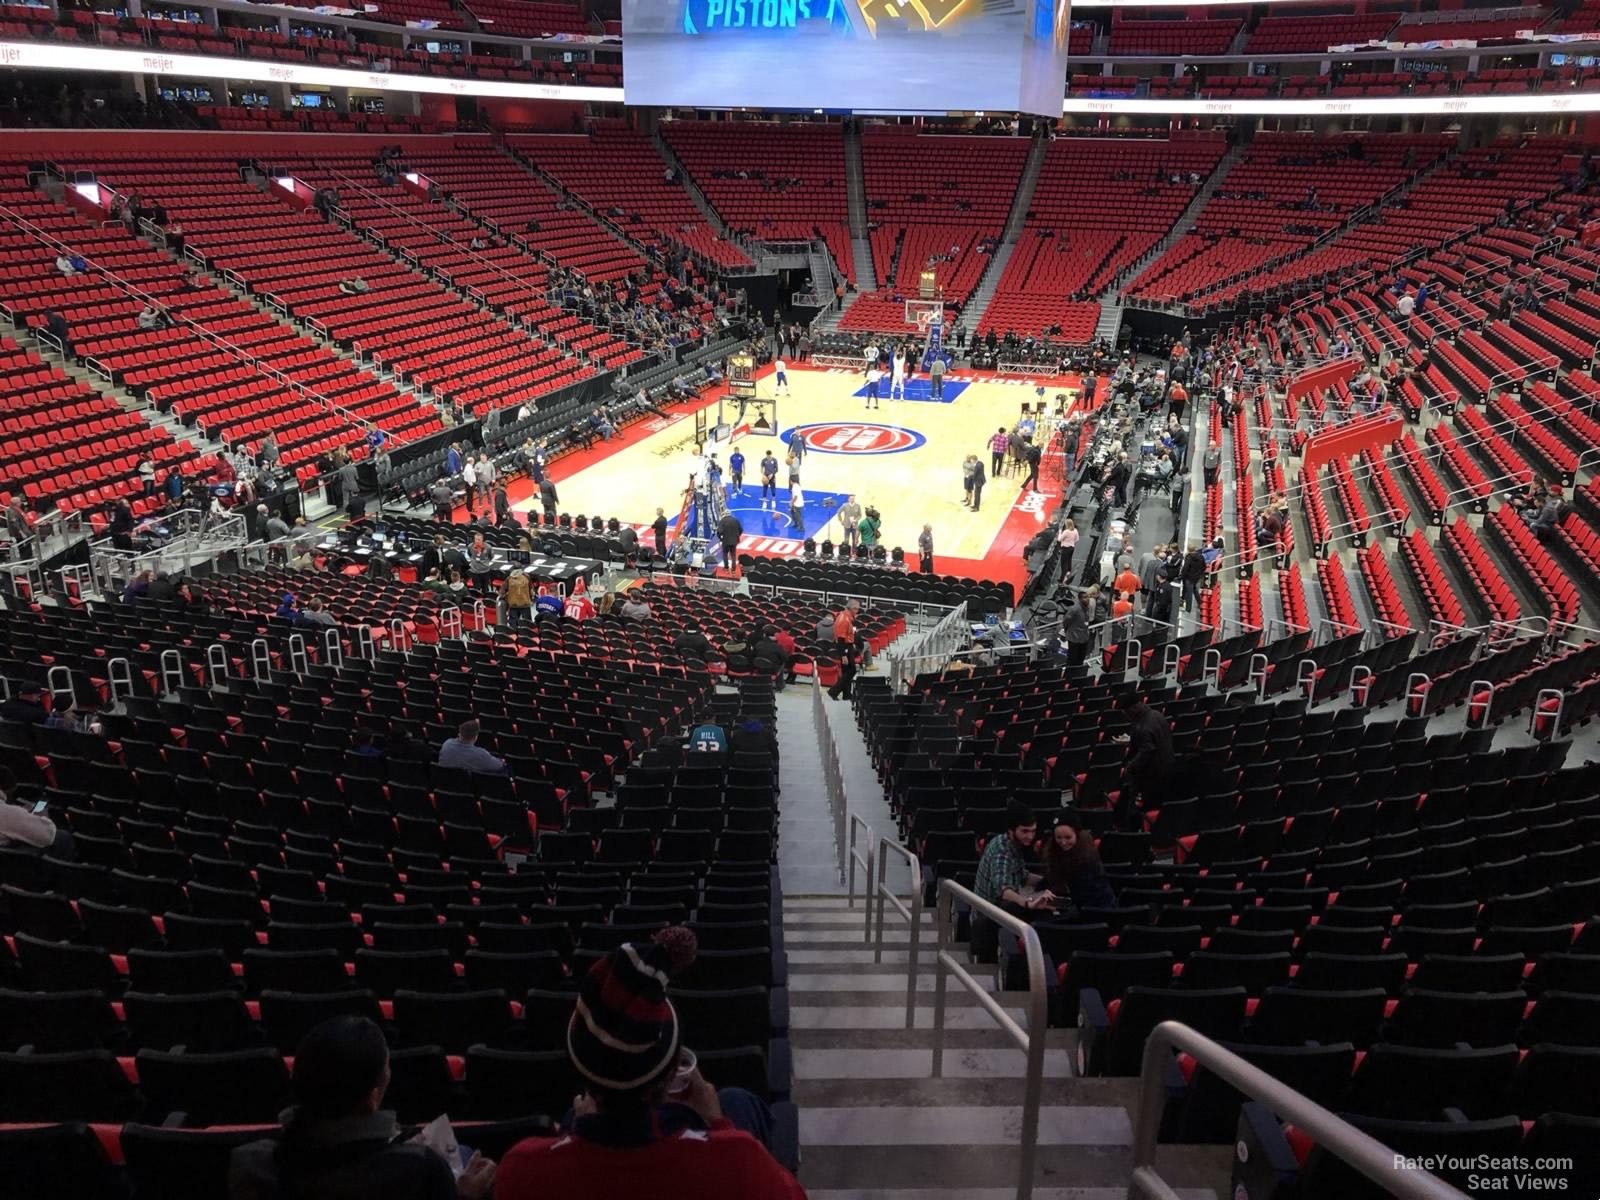 Little Caesars Arena Section 102 - Detroit Pistons - RateYourSeats.com